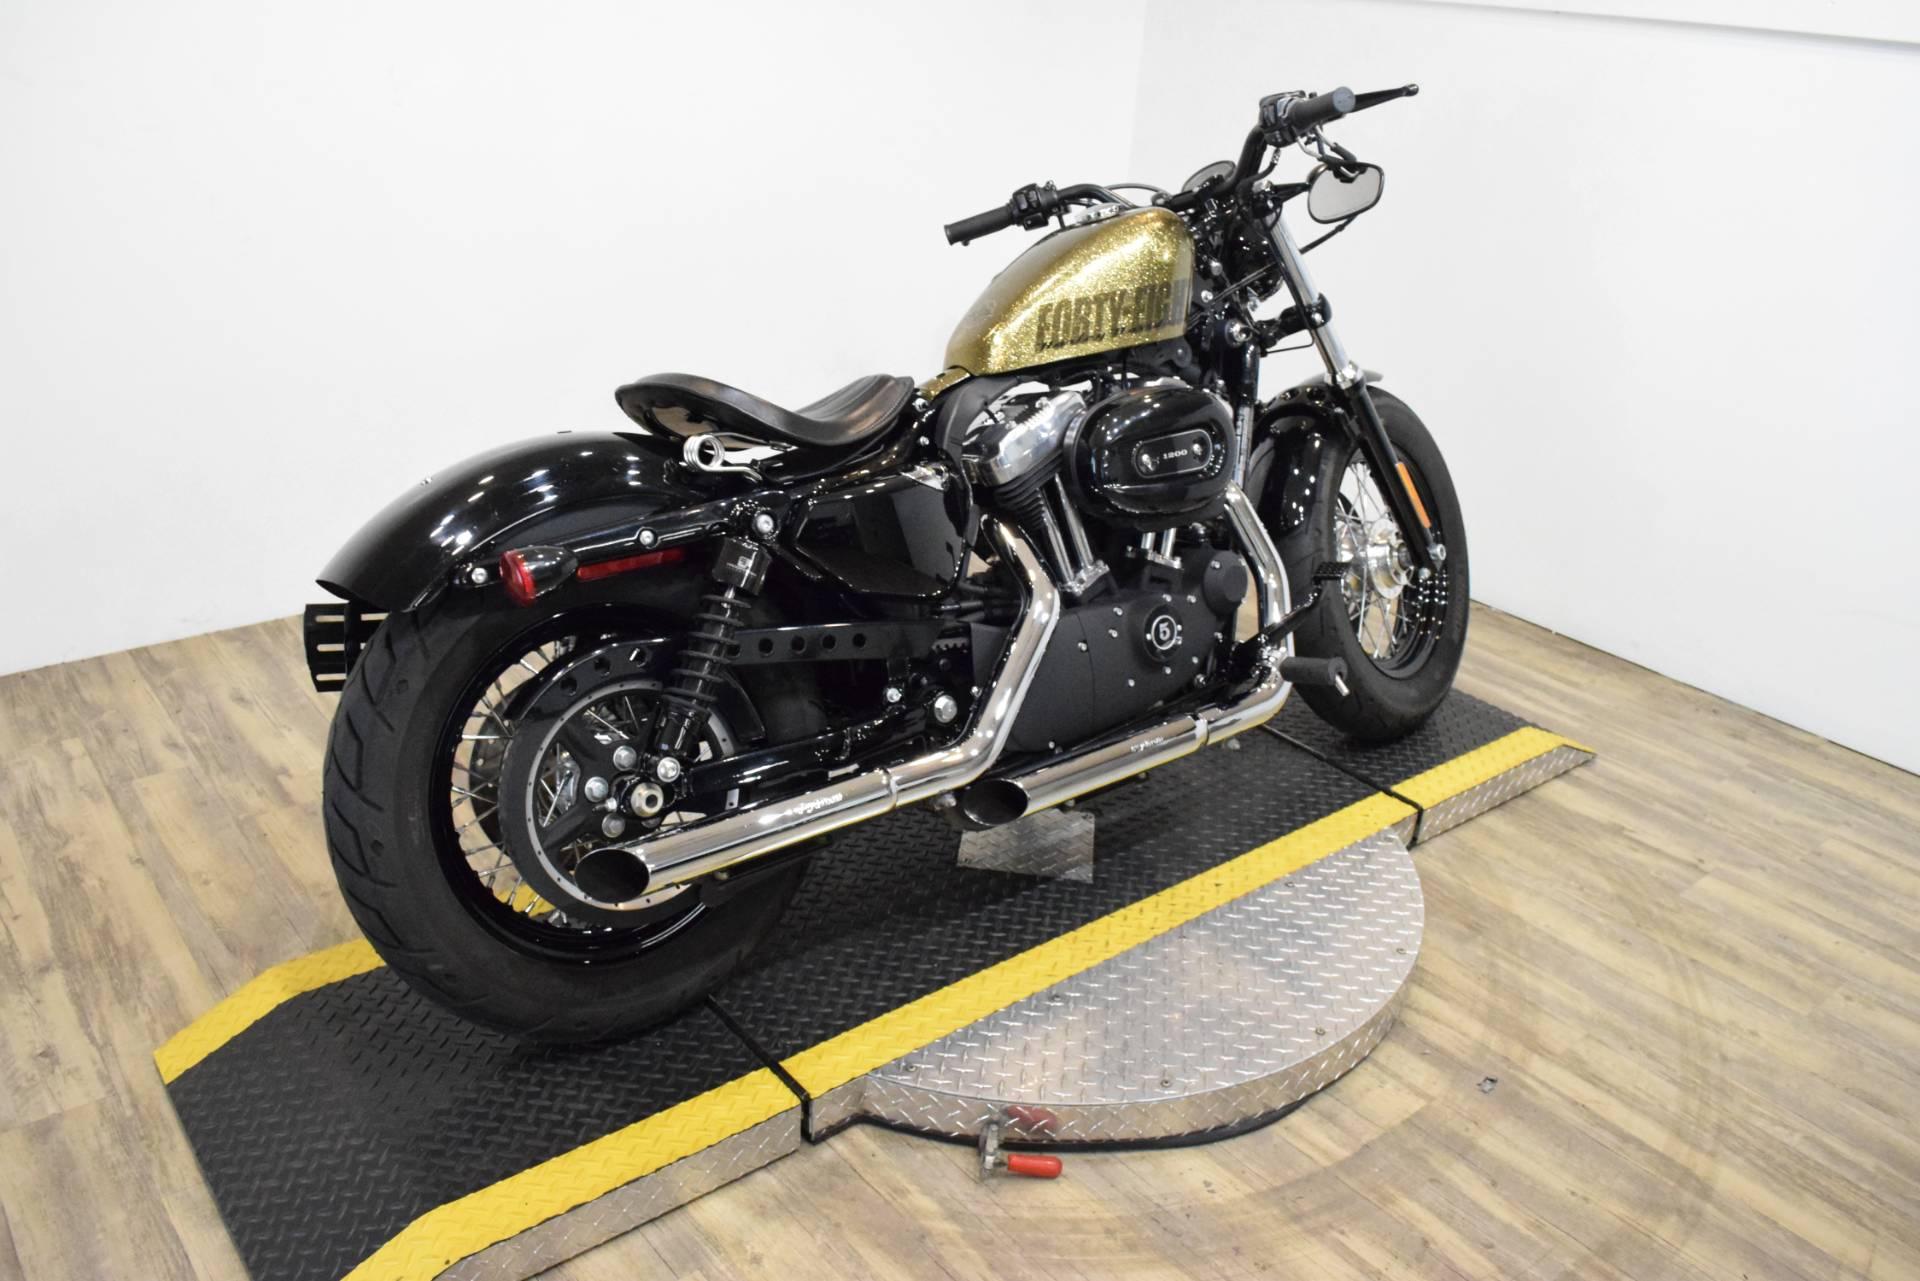 2013 Harley-Davidson Sportster Forty-Eight 10